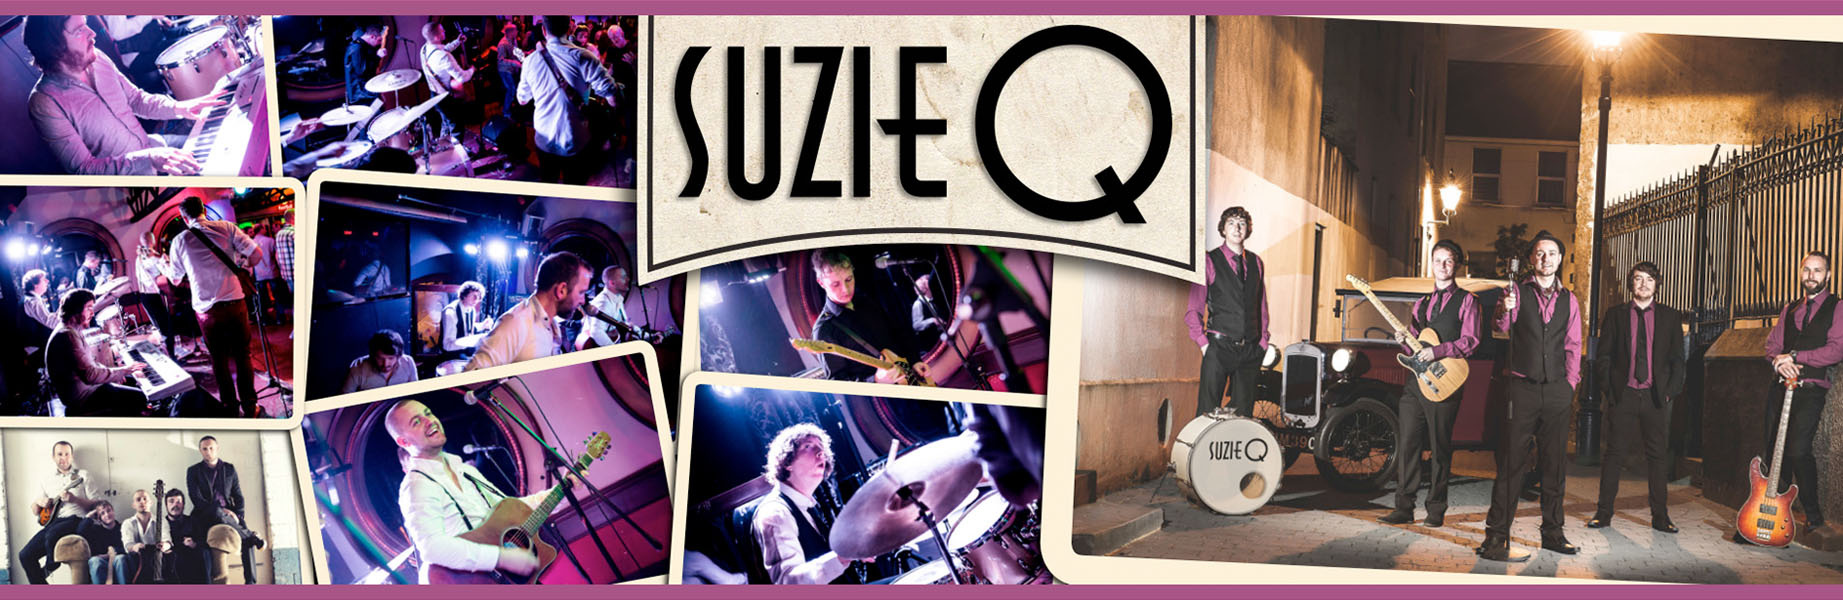 SuzieQ Ireland